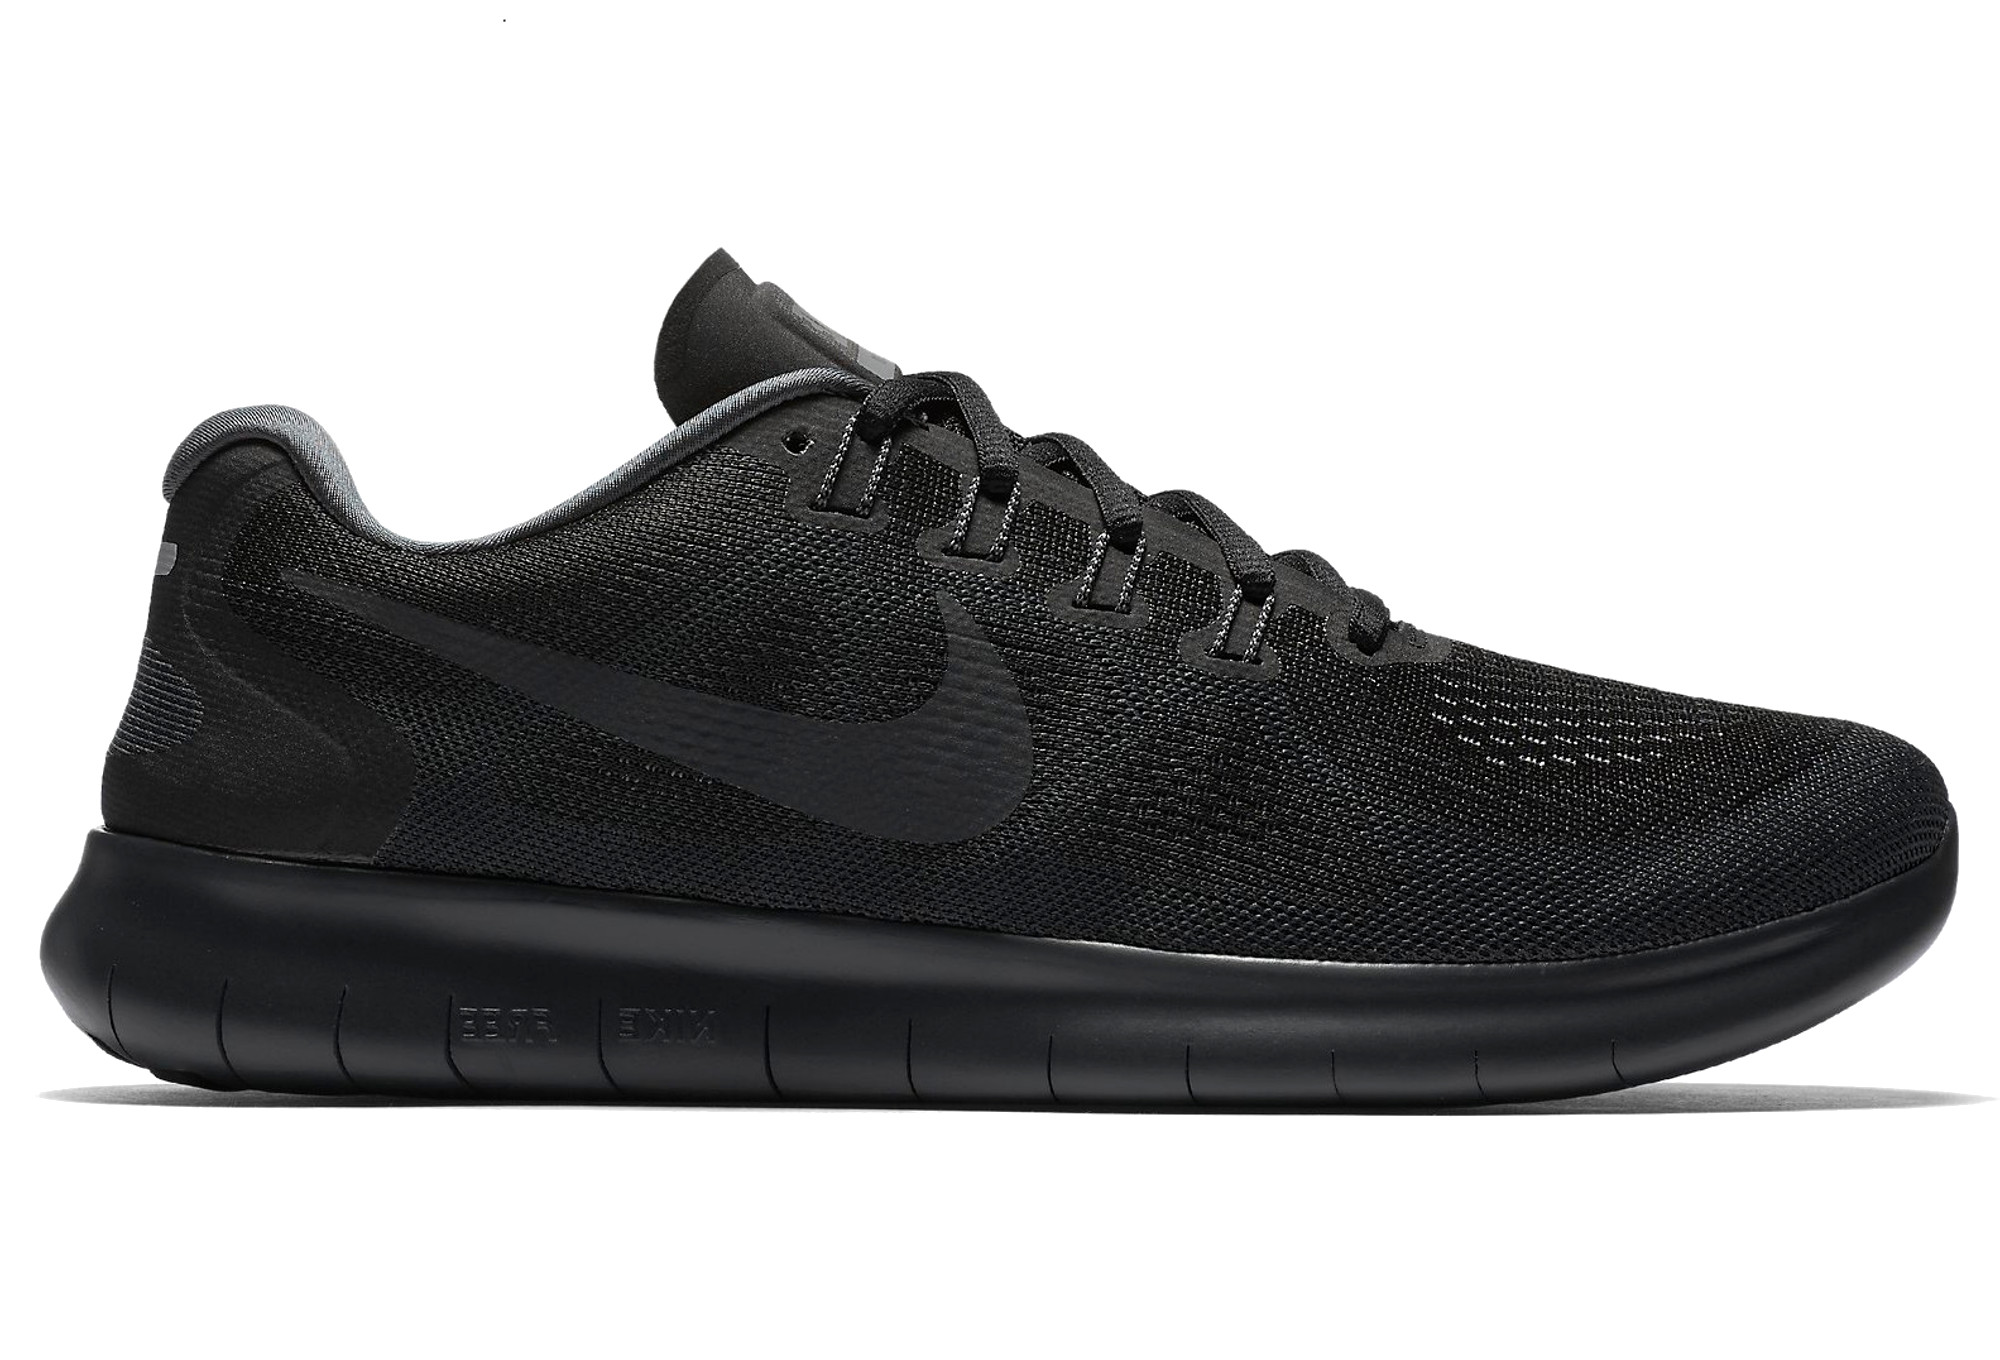 new style 1dbcb 216bc Chaussures de Running Femme Nike Free RN 2017 Noir